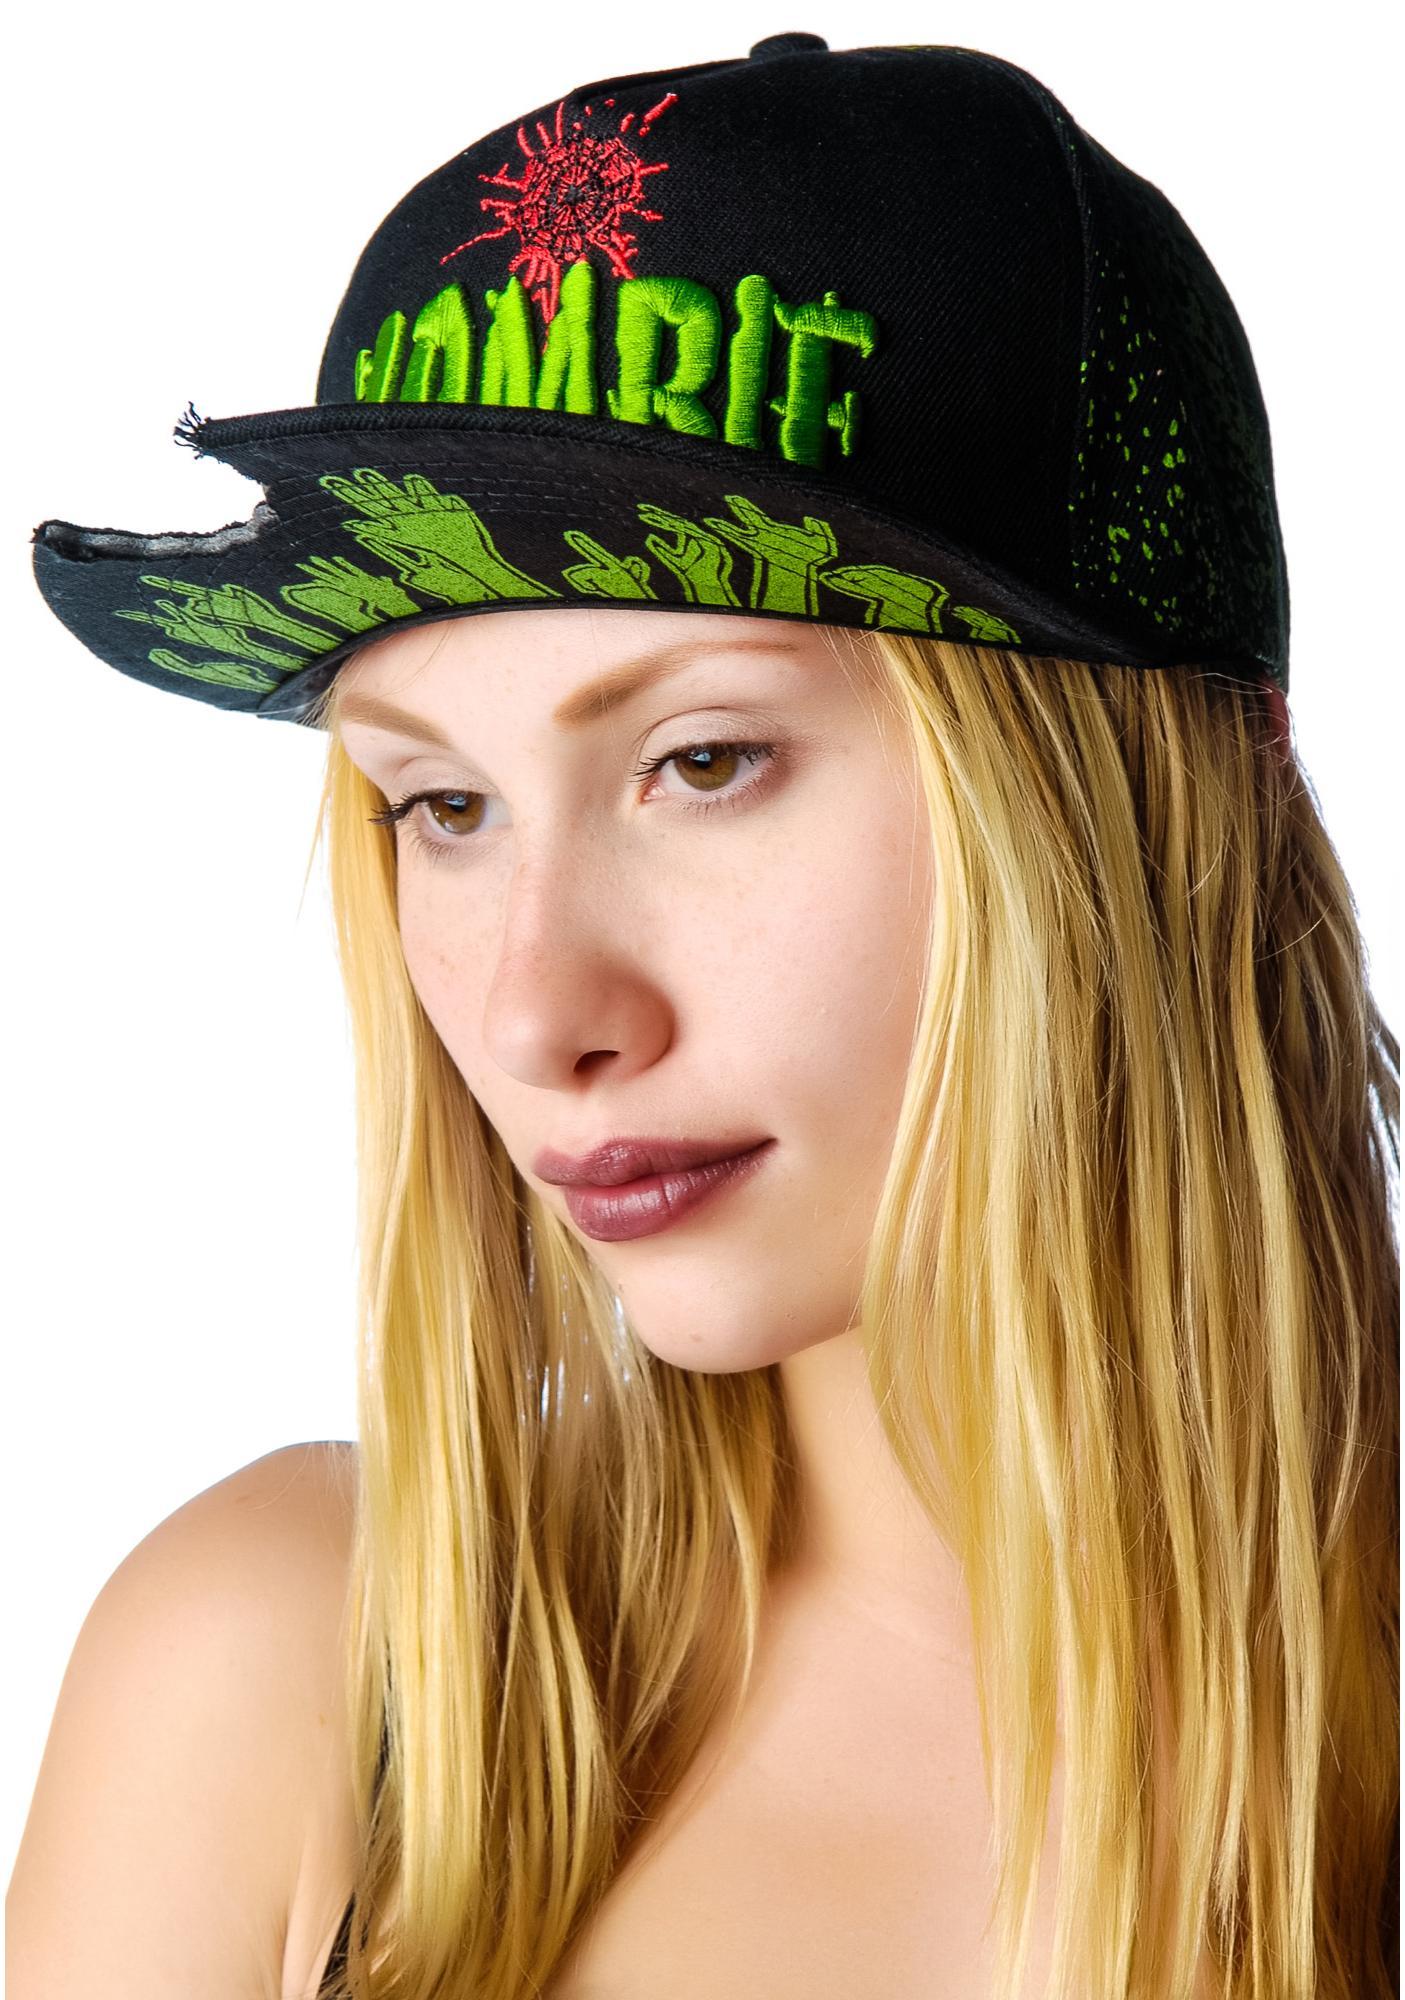 Kreepsville 666 Zombie Baseball Hat